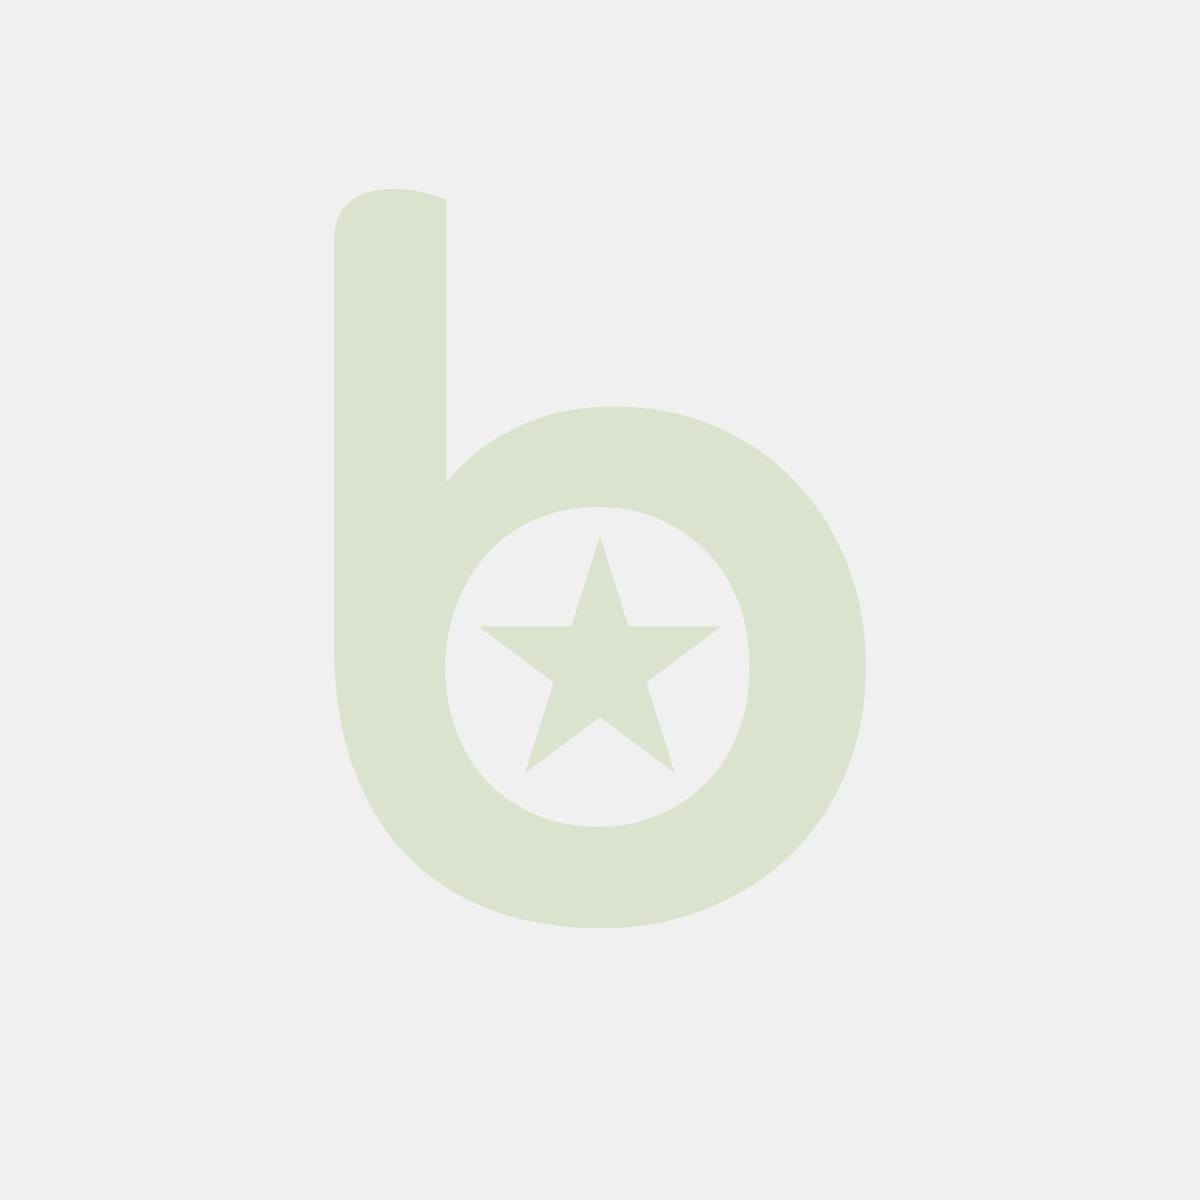 Pojemnik Gn 1/3 - 325X176 Mm 100